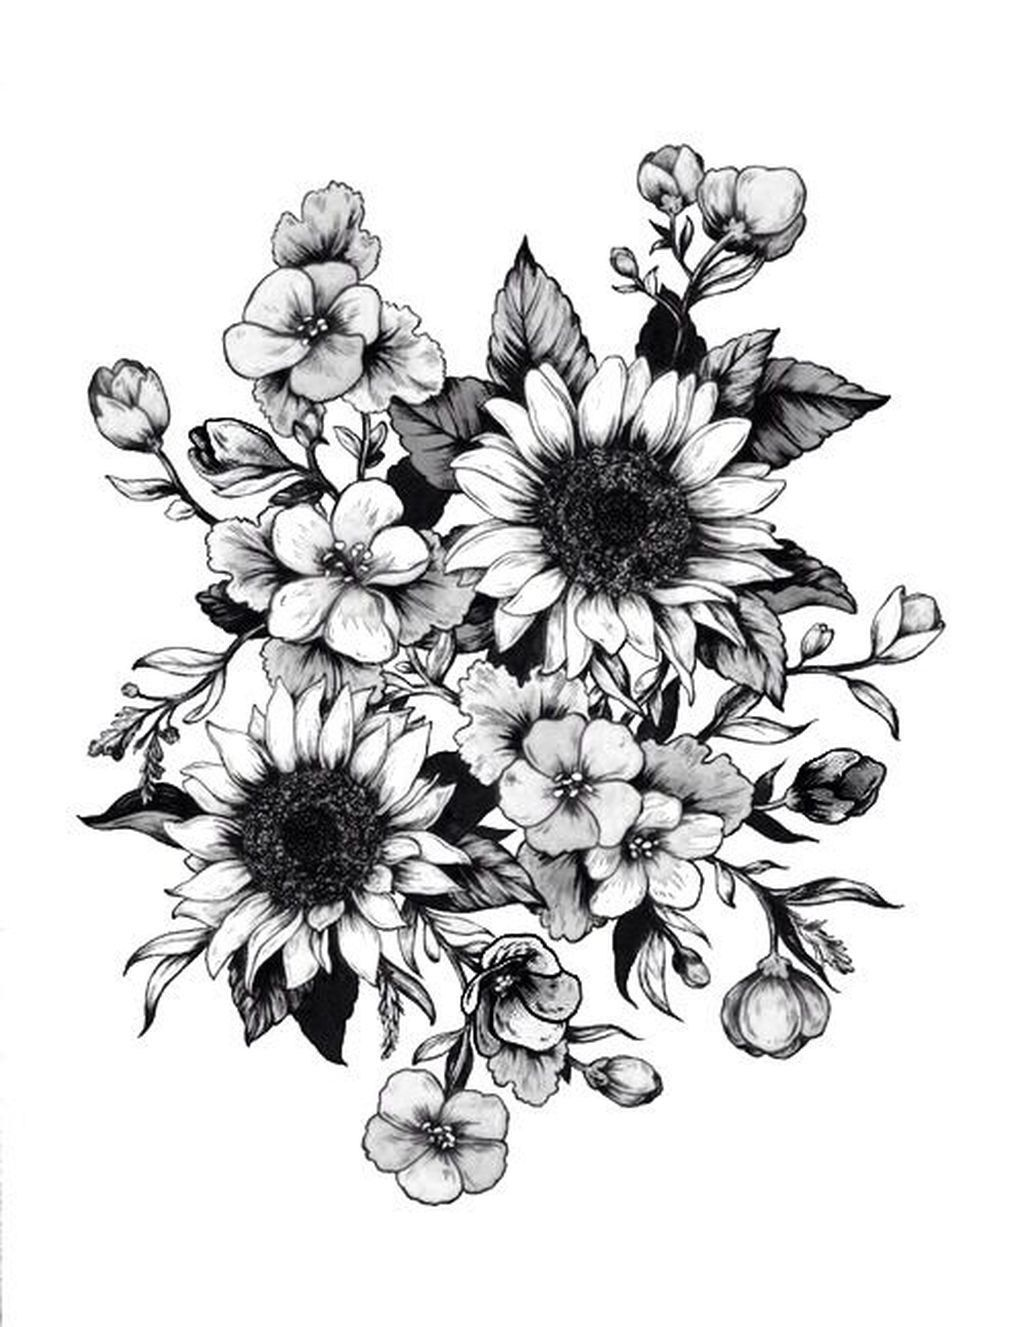 28 Impressive Black And White Sunflower Tattoo Wildflower Tattoo Forearm Flower Tattoo Sunflower Tattoo Sleeve